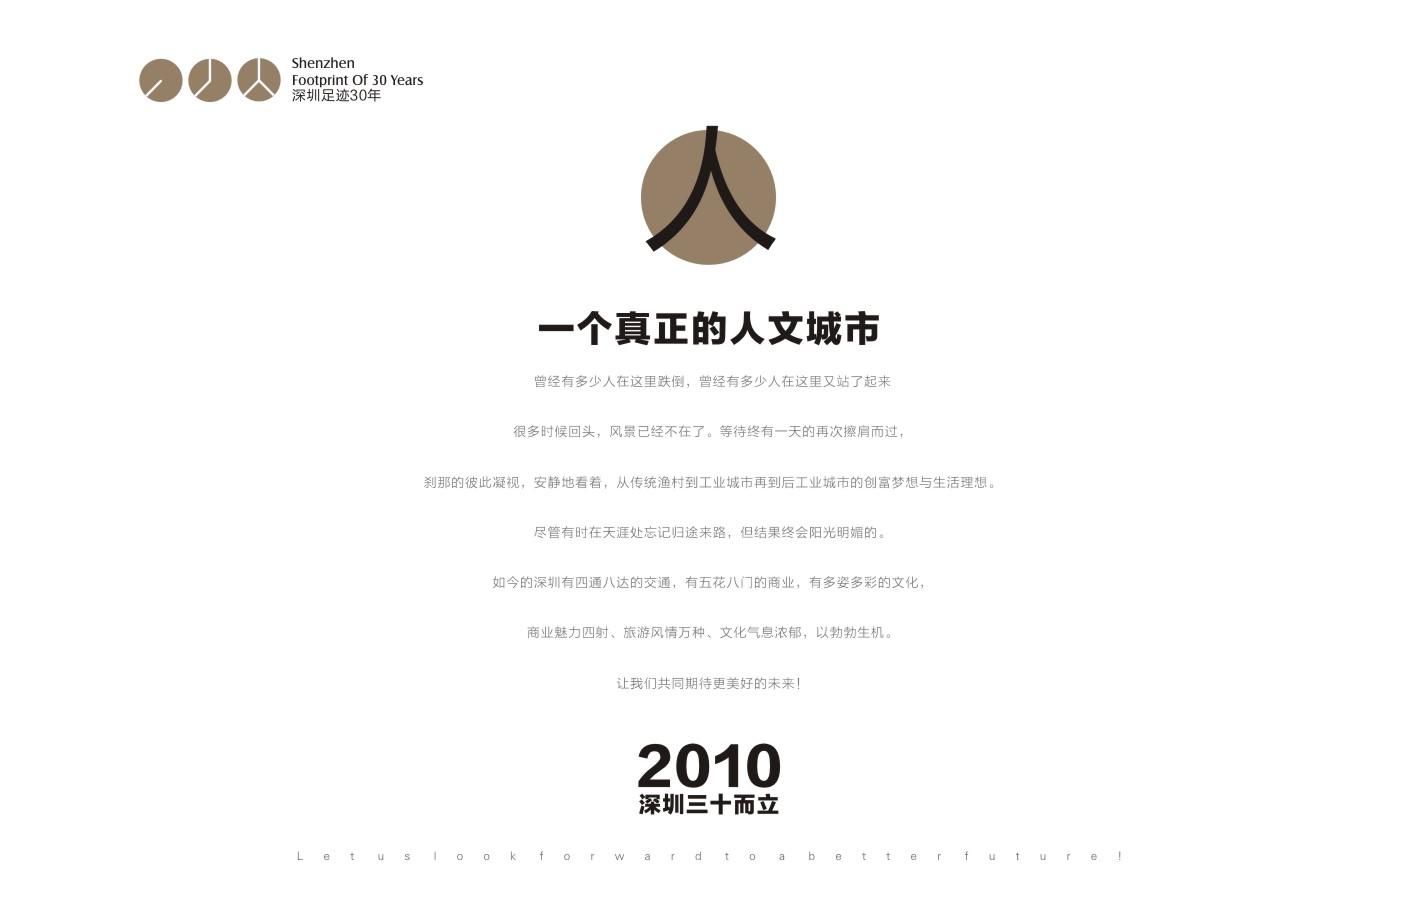 深圳足跡30年